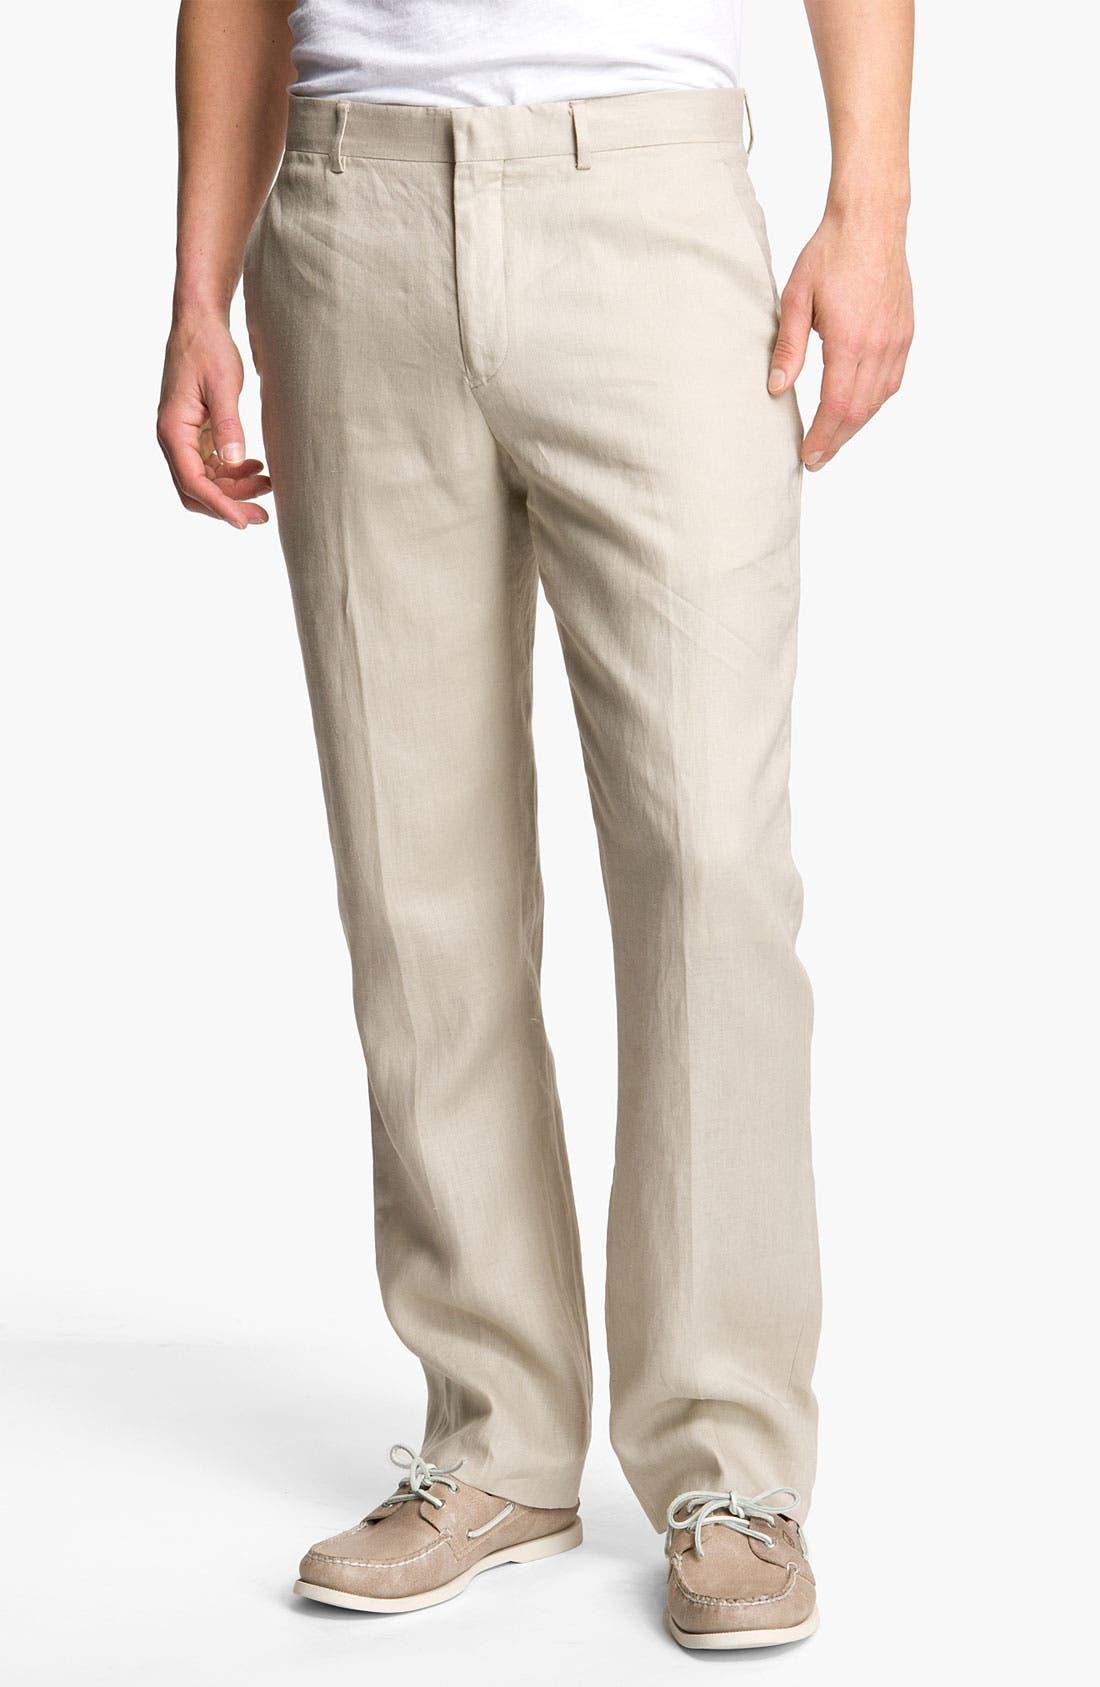 Main Image - Michael Kors 'Classic' Linen Pants